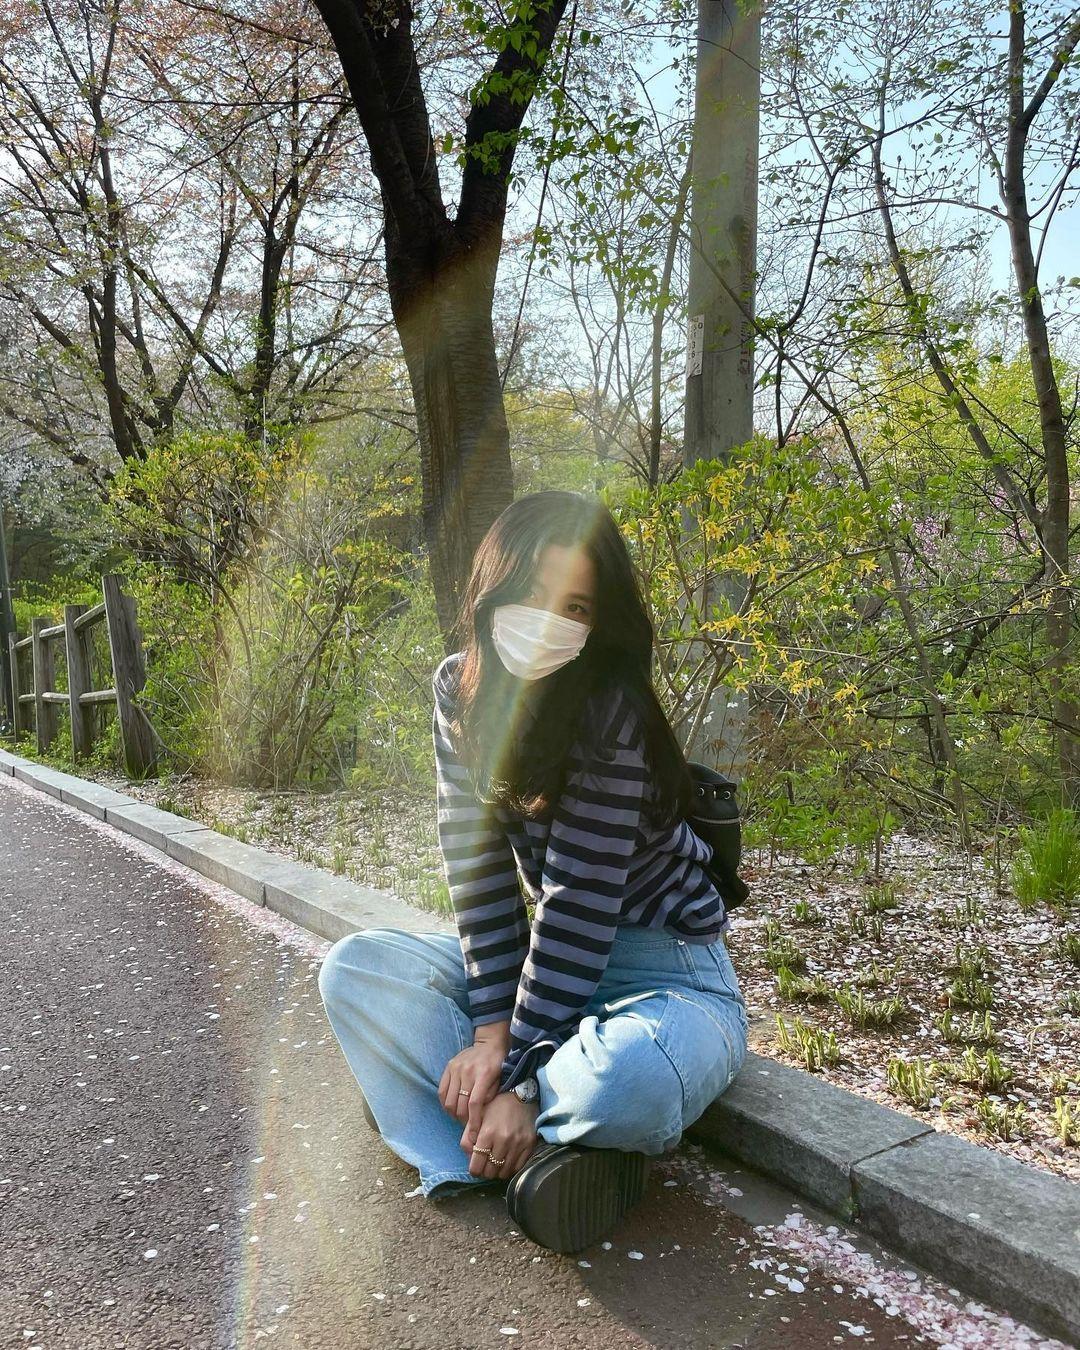 Pesona Jisoo 'Blackpink' yang Segera Comeback di Drama Terbaru